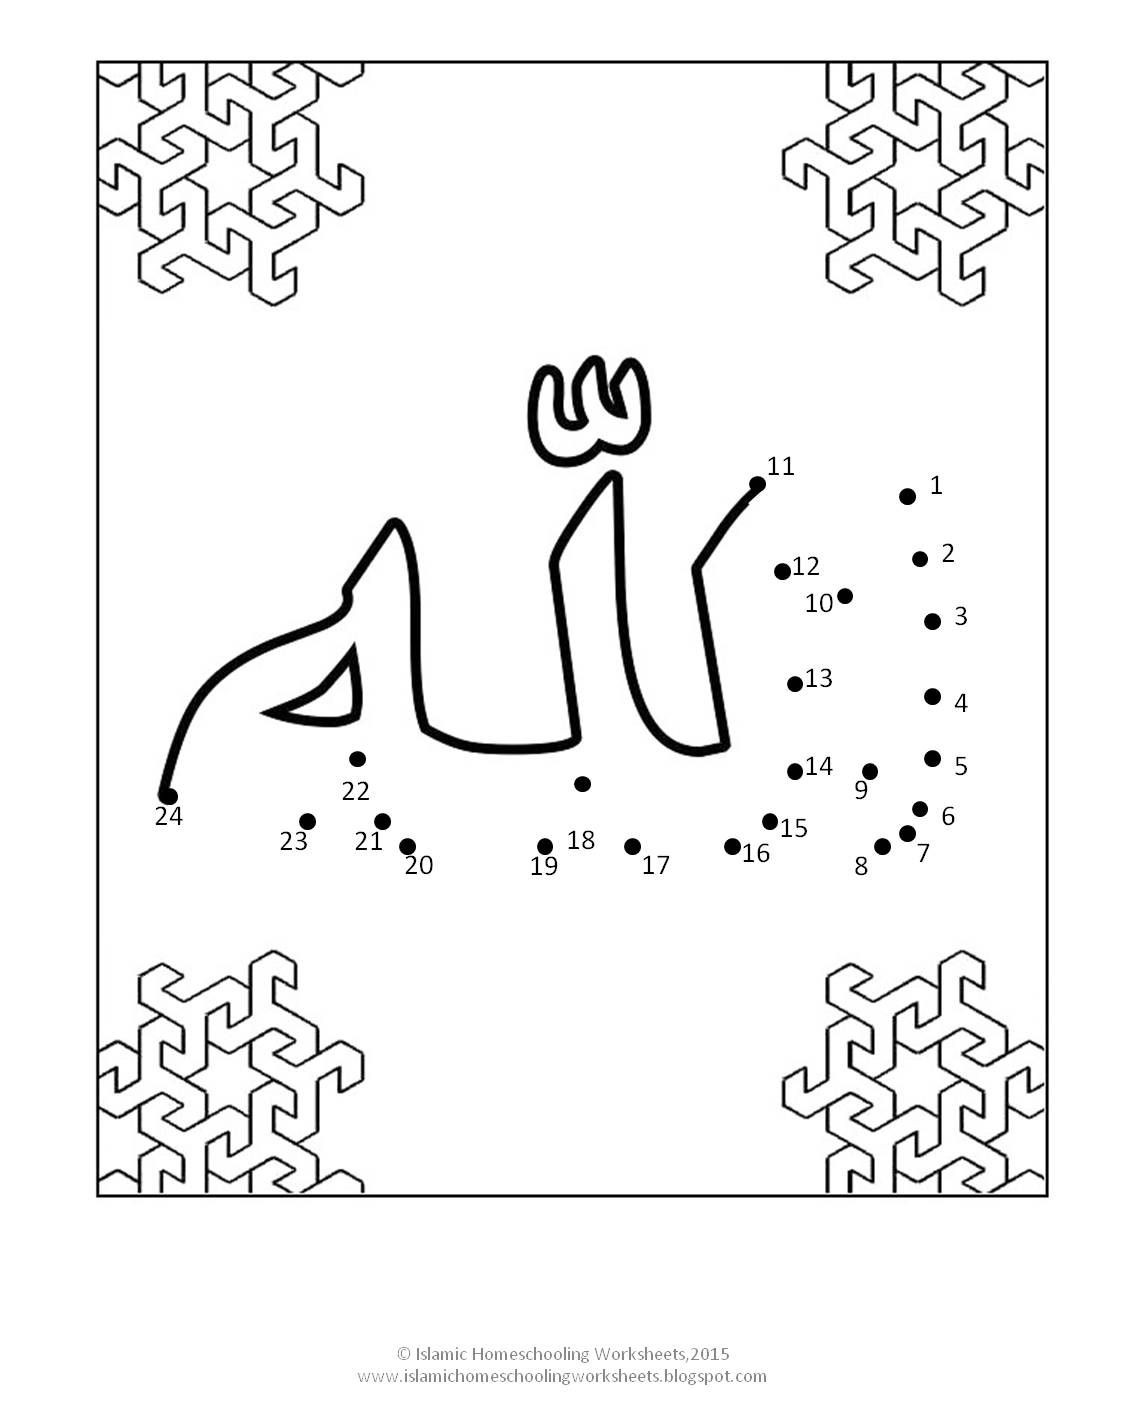 Islamic Homeschooling Malaysia